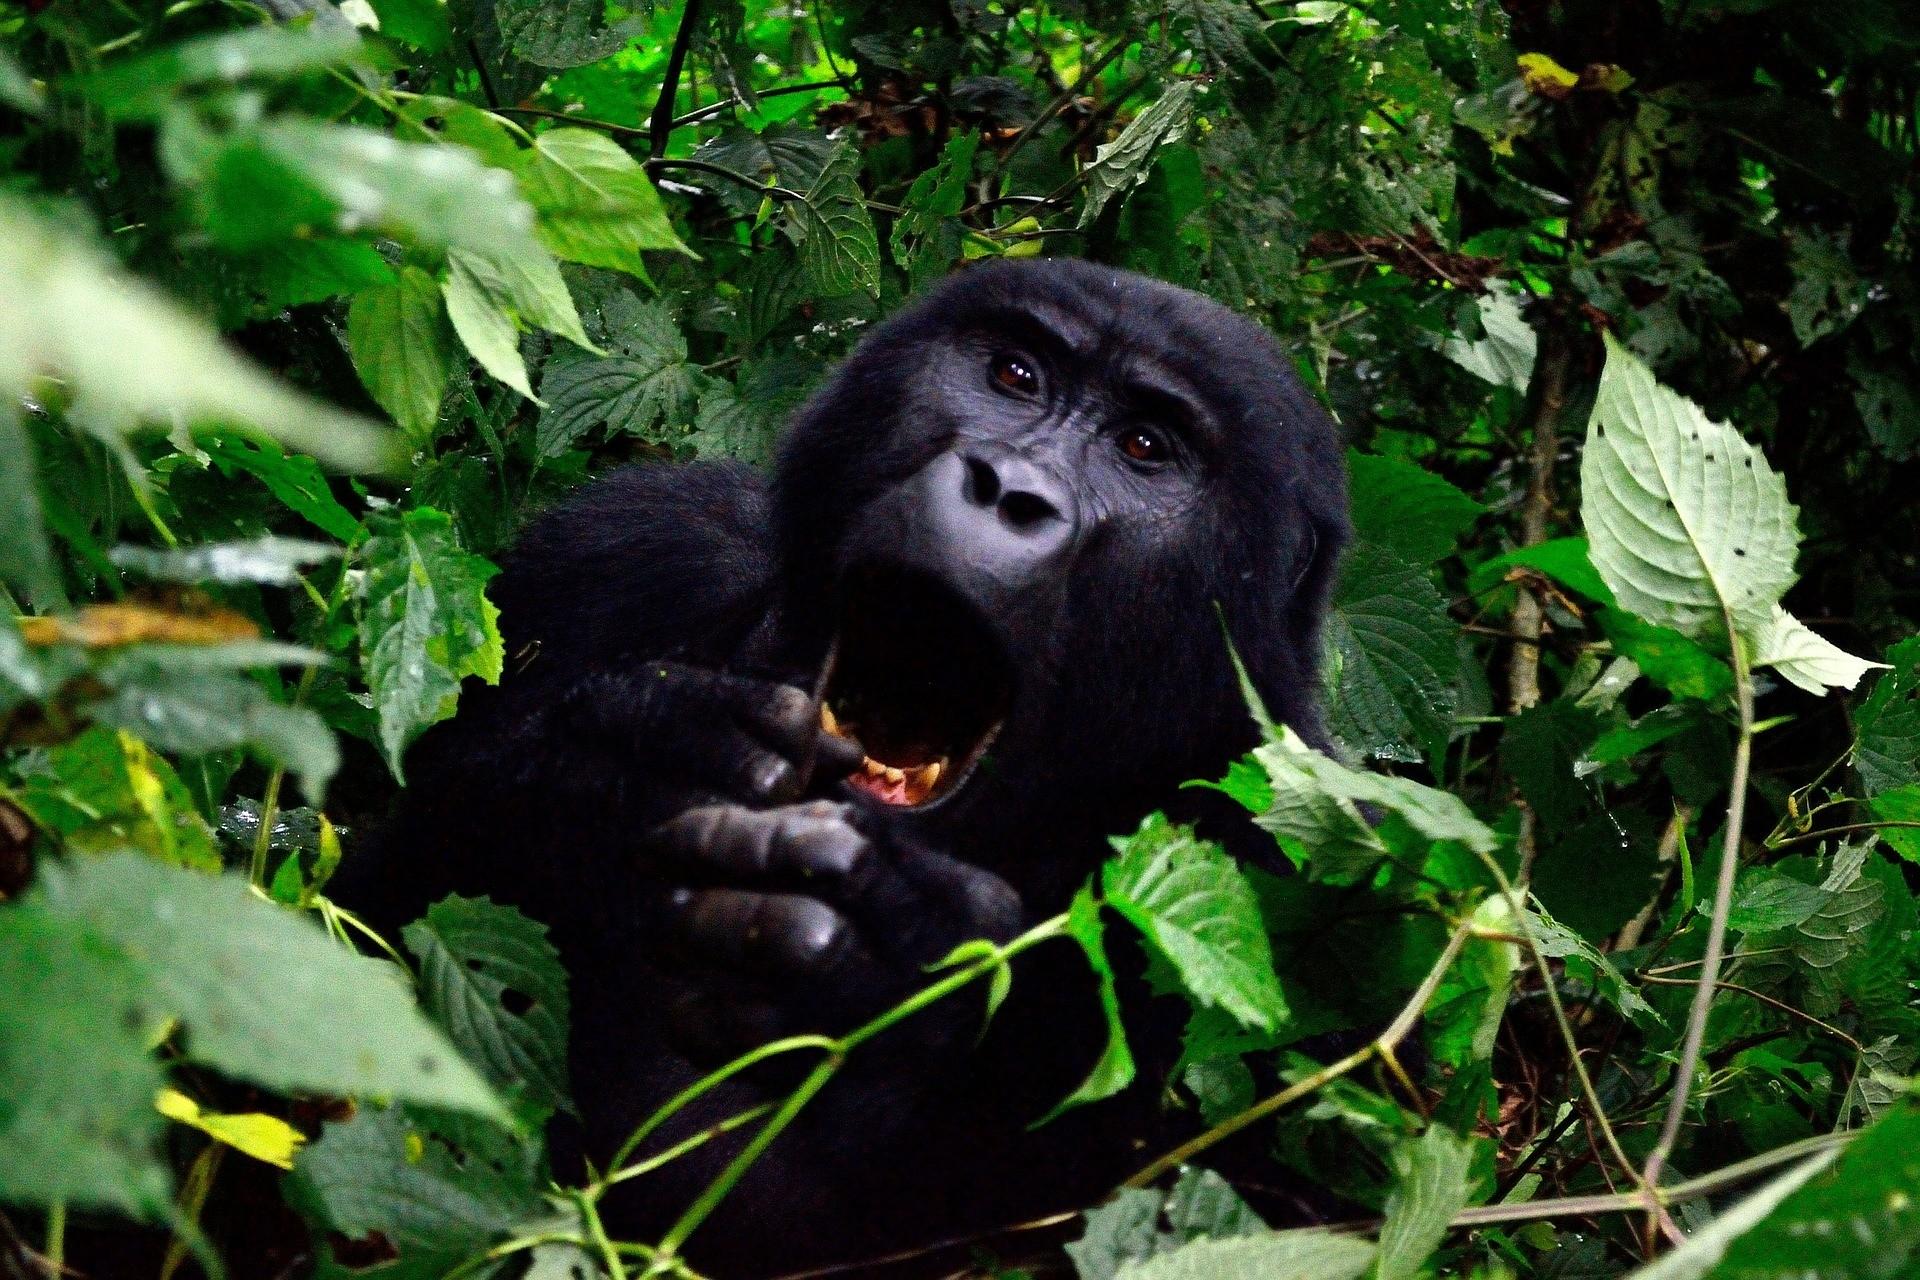 Een gorilla in Bwindi, Oeganda